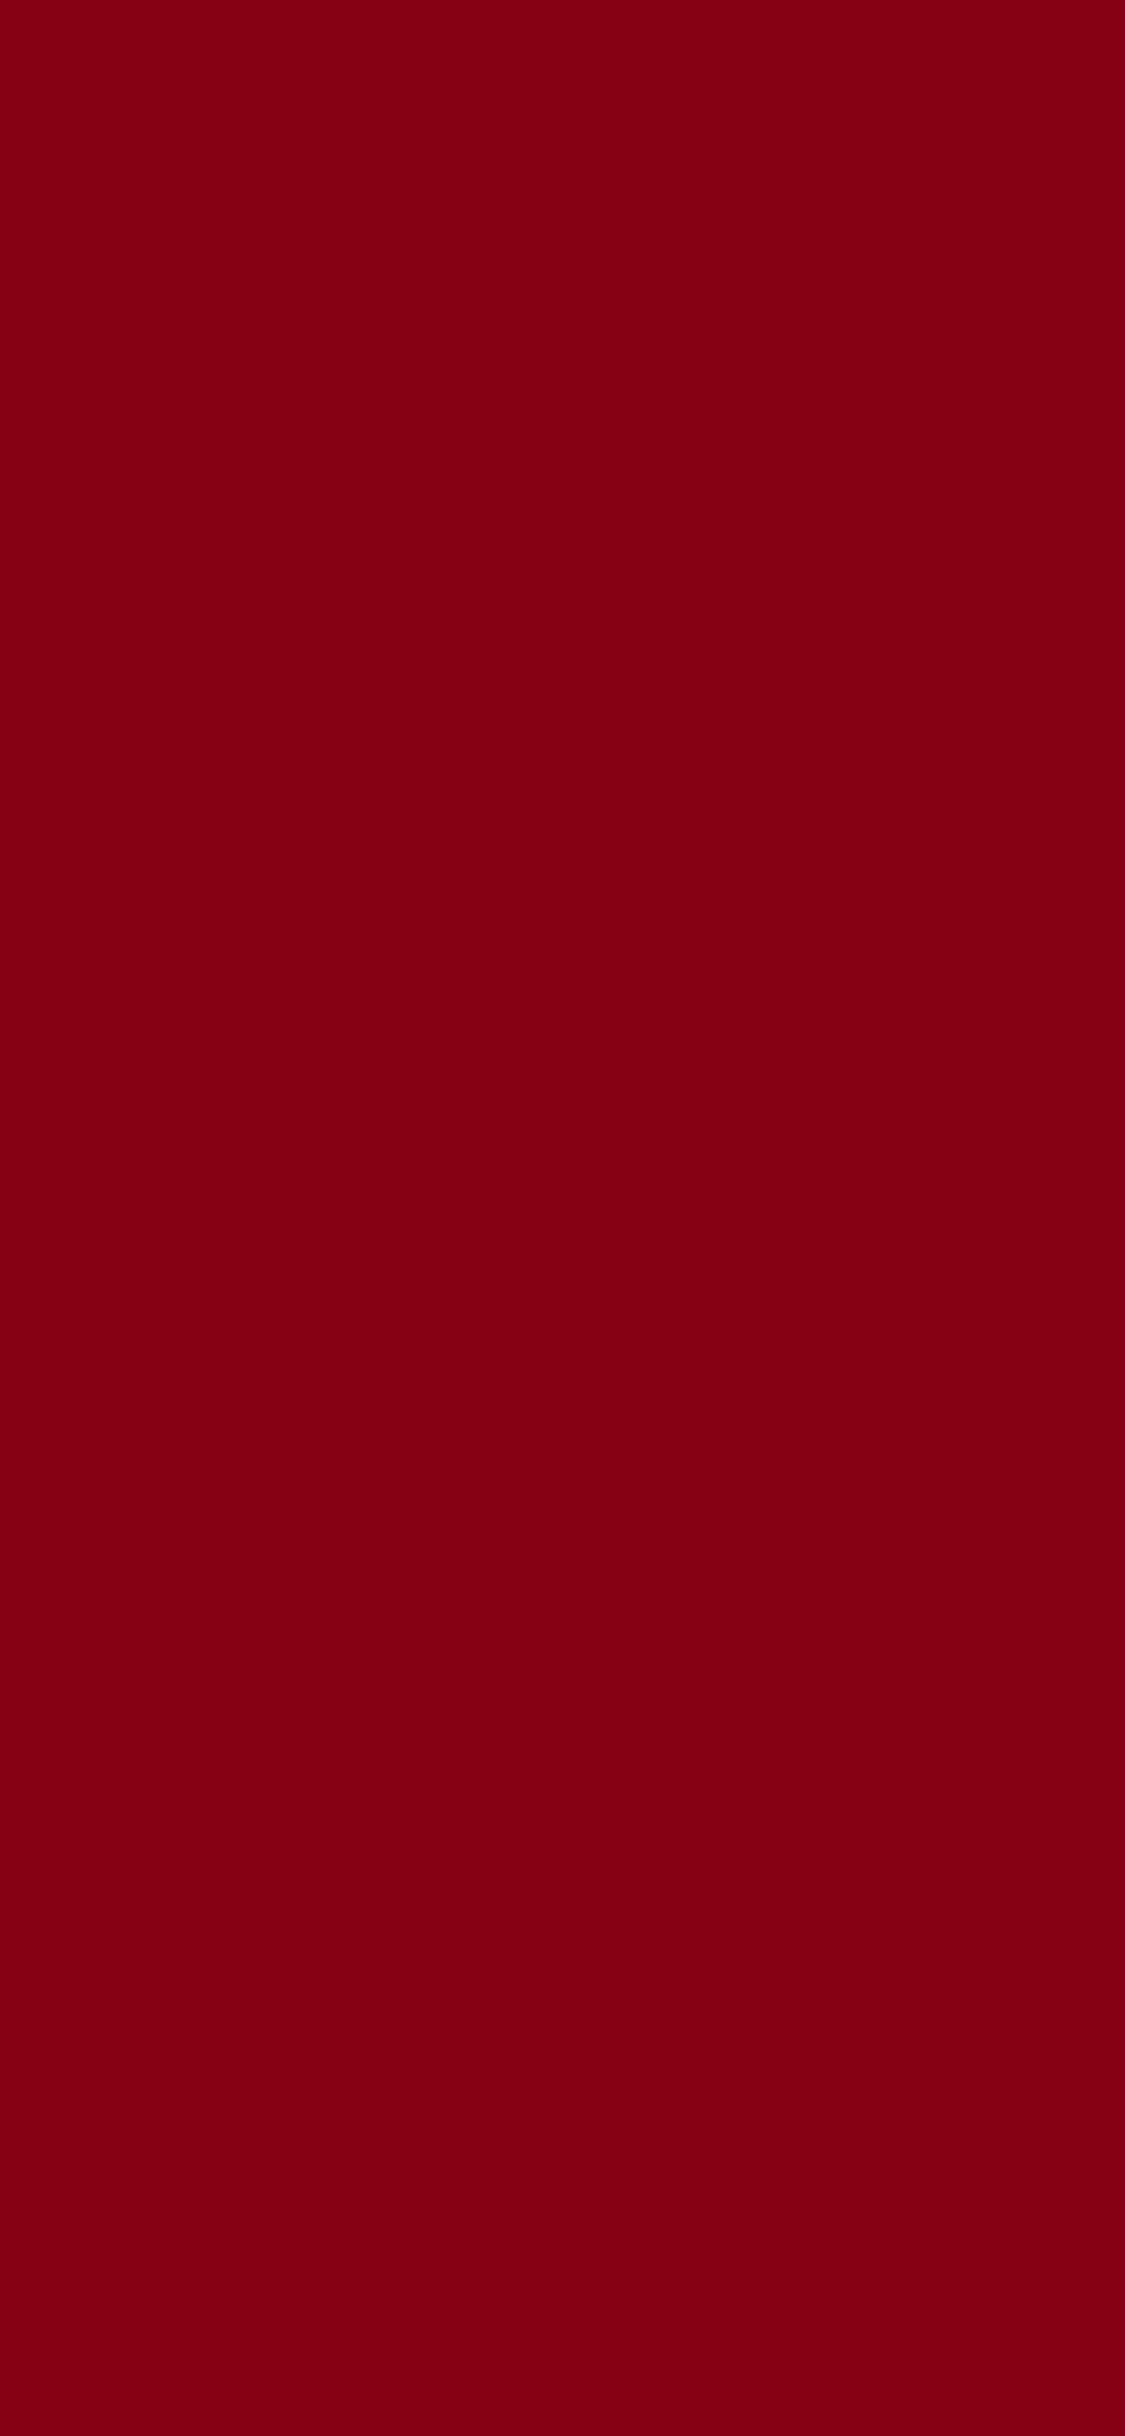 1125x2436 Red Devil Solid Color Background